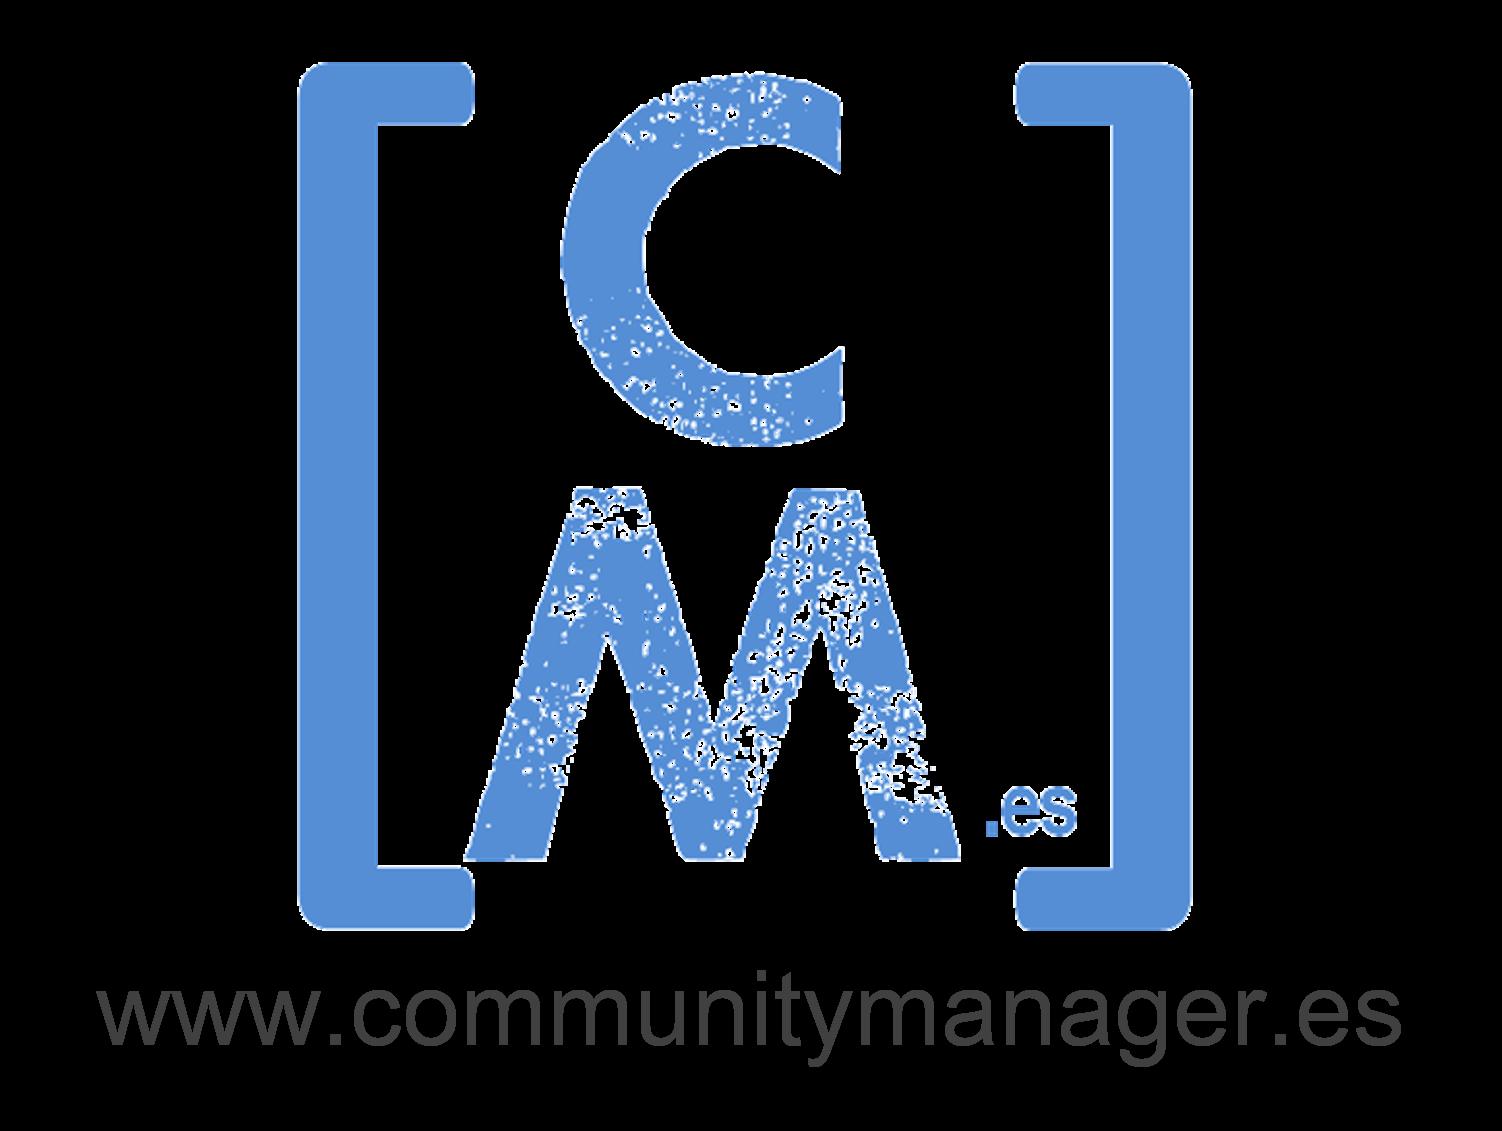 http://communitymanager.es